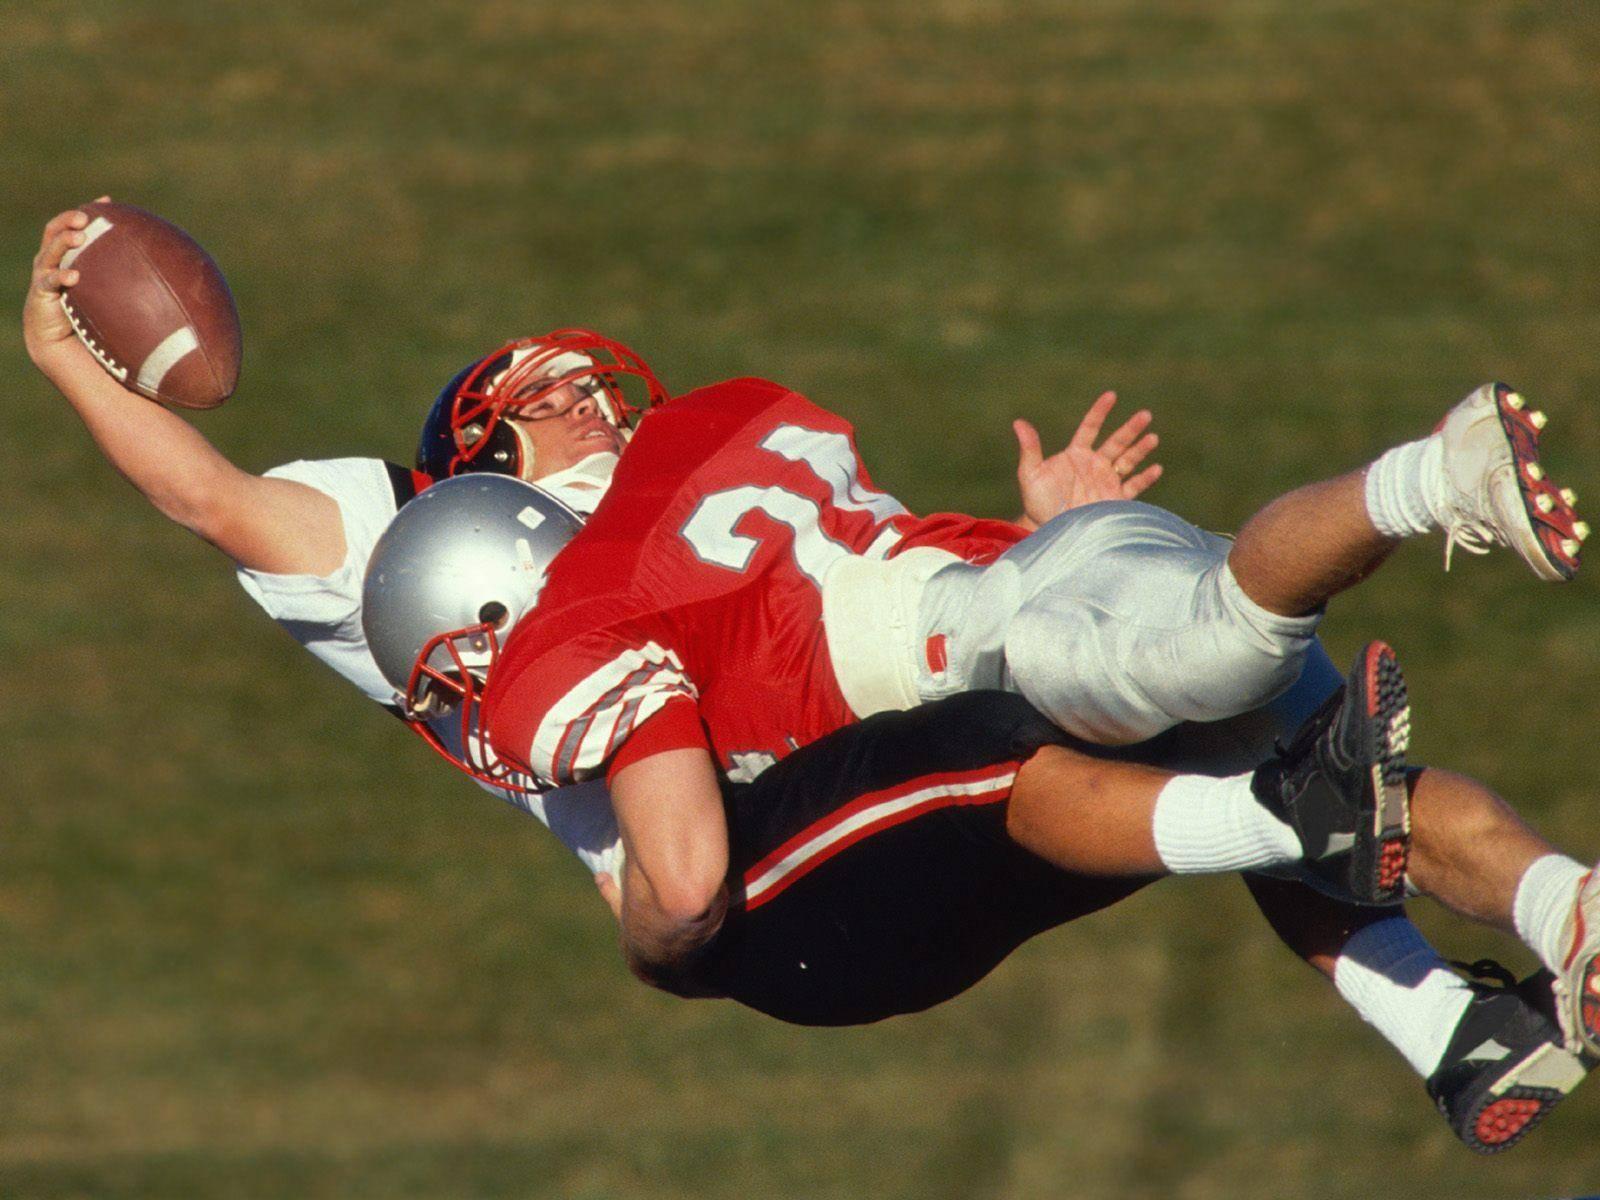 Football-Shoulder-Dislocation-Injury